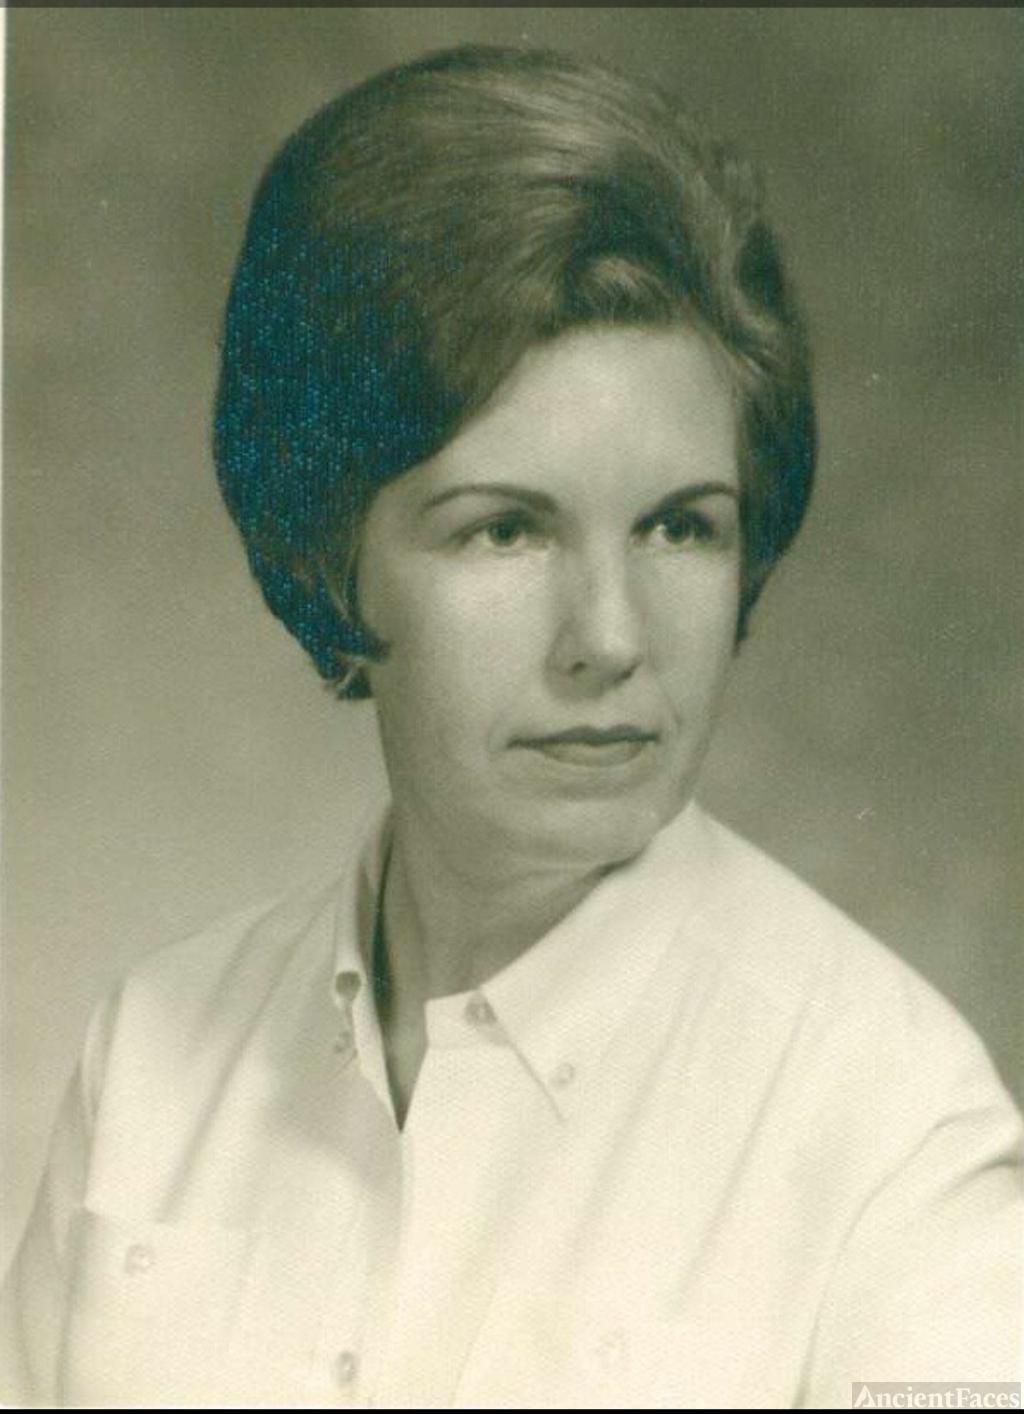 Norma Lee Martin